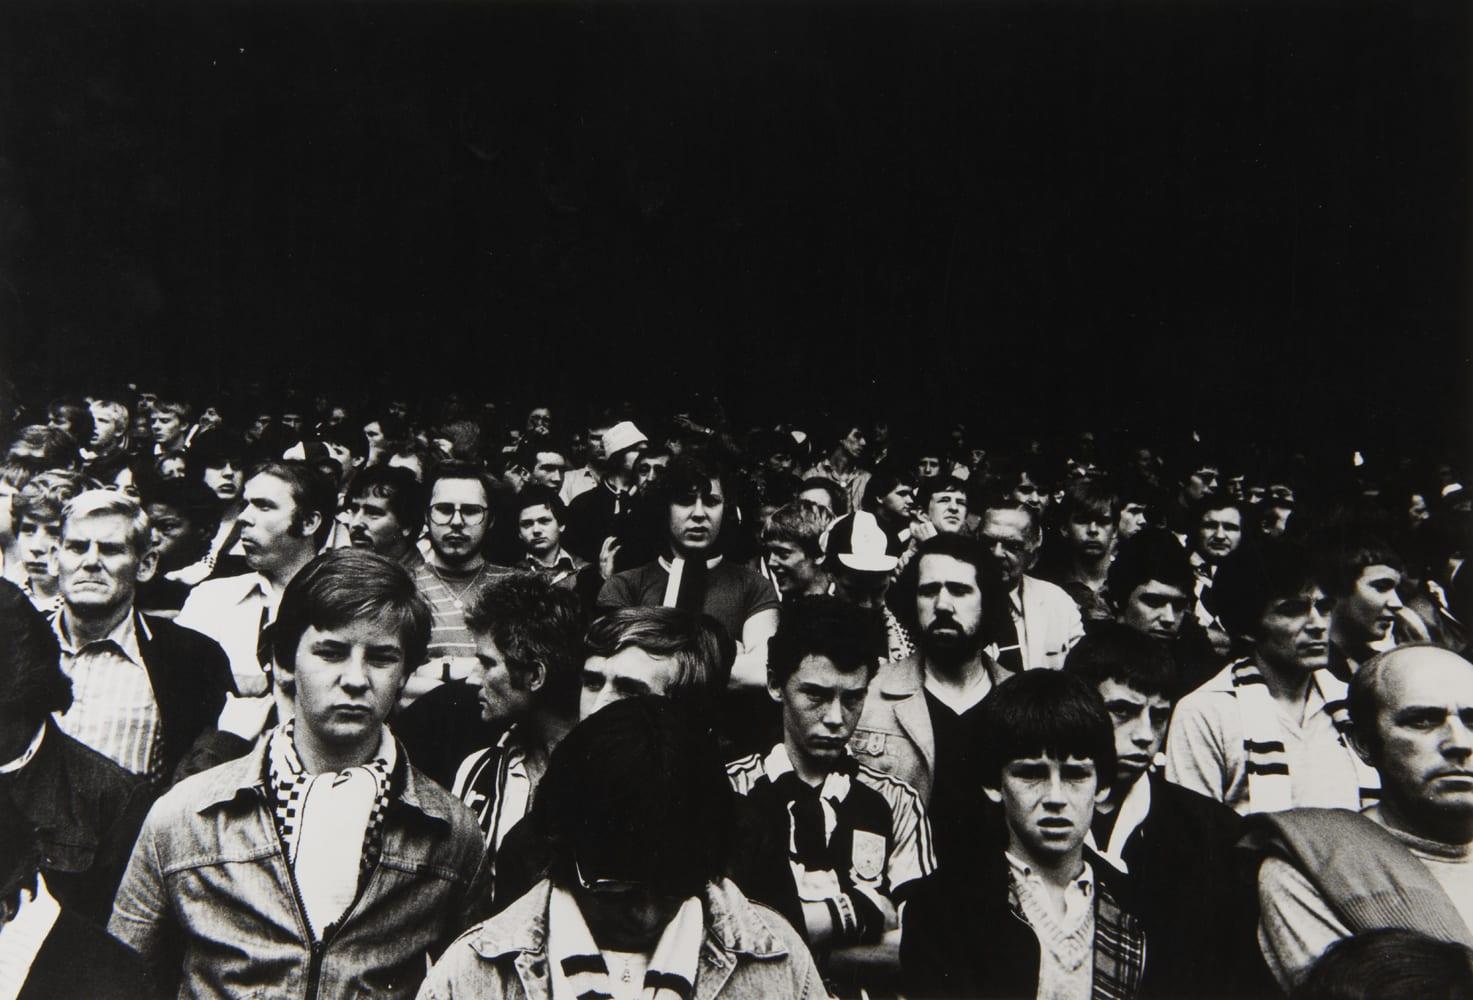 West Ham football supporters 1976, Dick Scott-Stewart